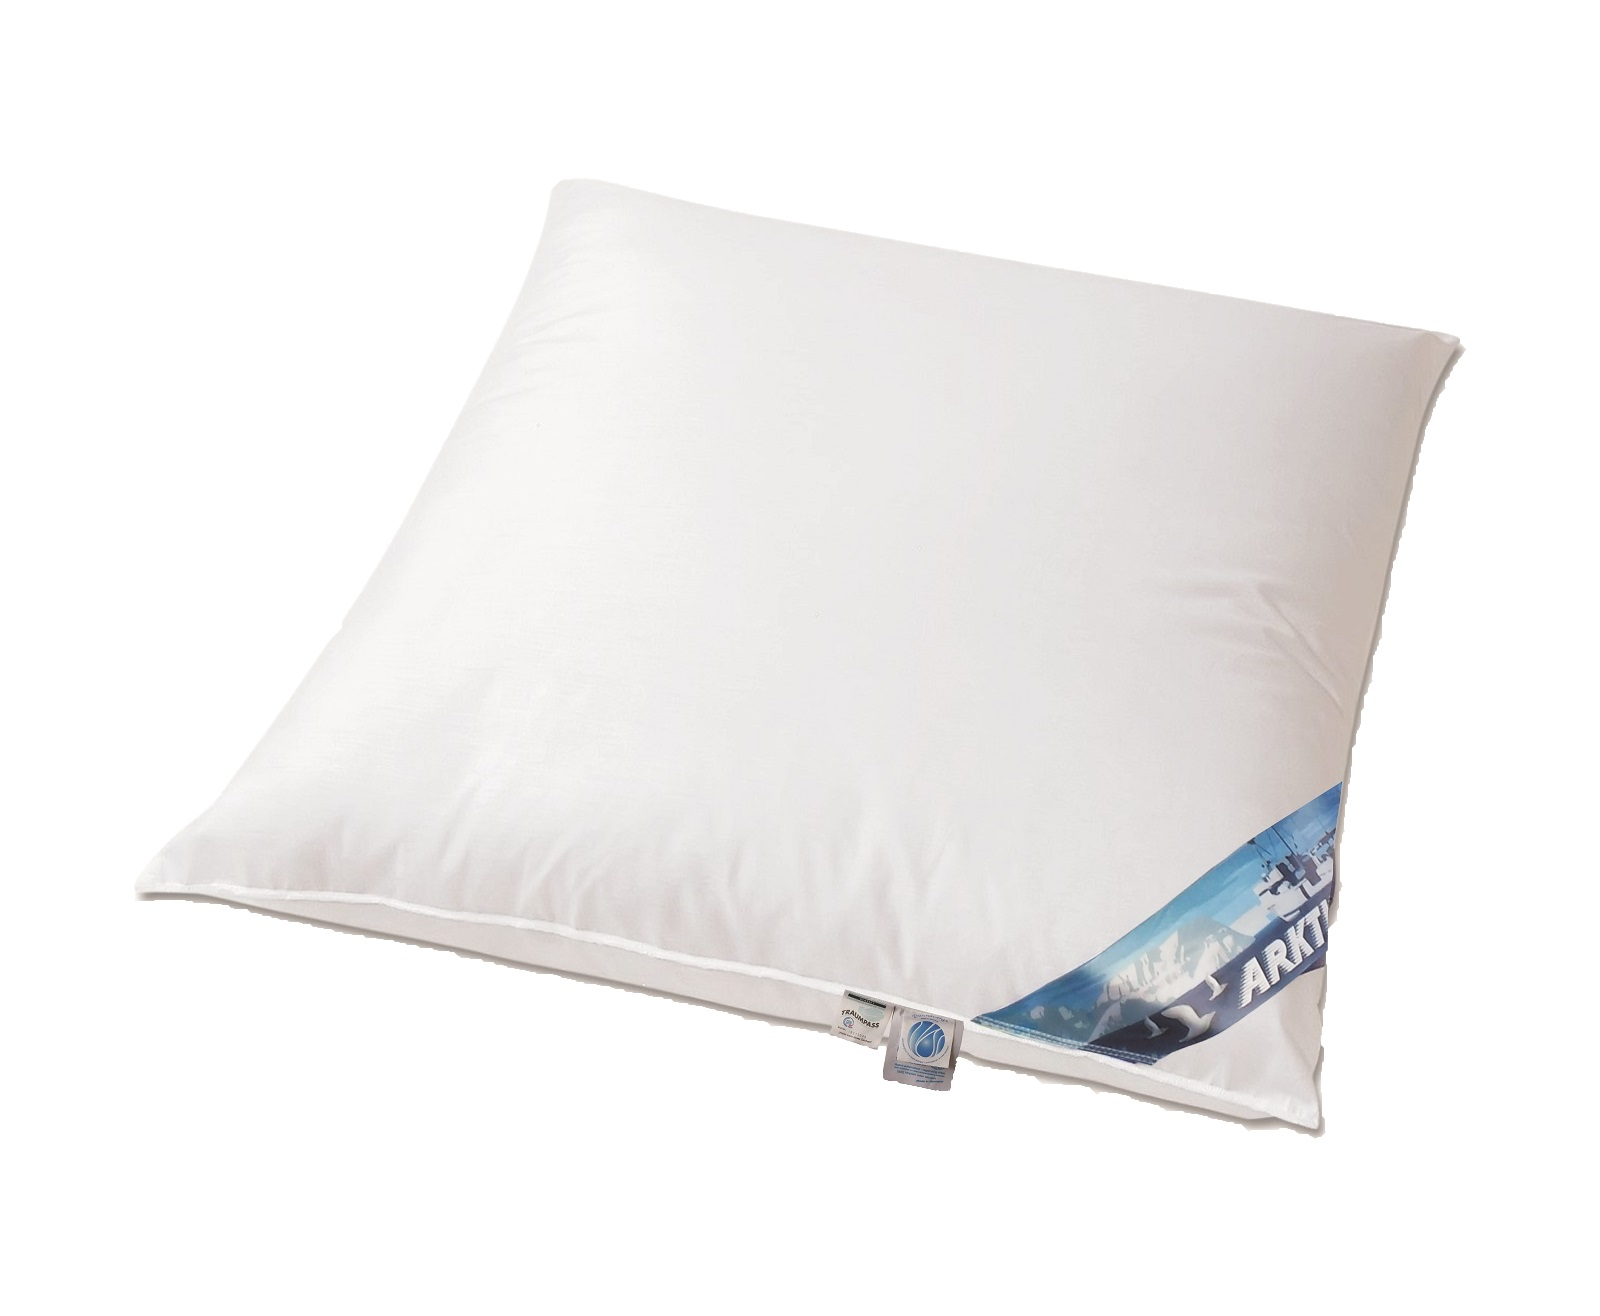 arktic daunenkissen arktischer daunenflaum 100 daunen 80x80 weich. Black Bedroom Furniture Sets. Home Design Ideas